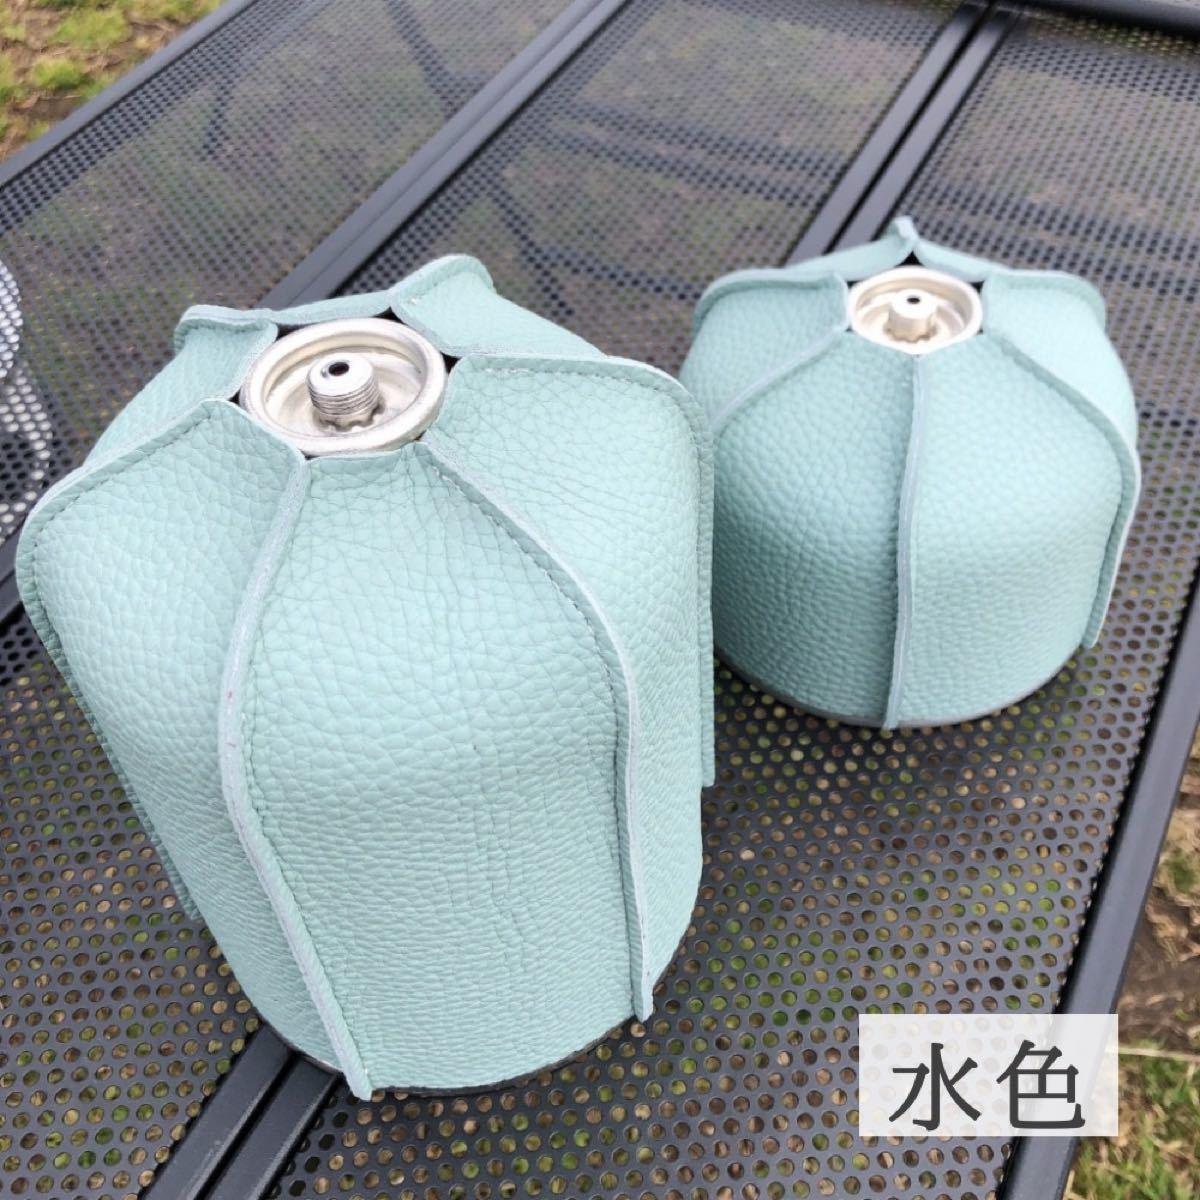 OD缶カバー ショート缶用 230/250g 革 アウトドア ガス缶 ケース  ヴィンテージ キャンプ ランタン 水色